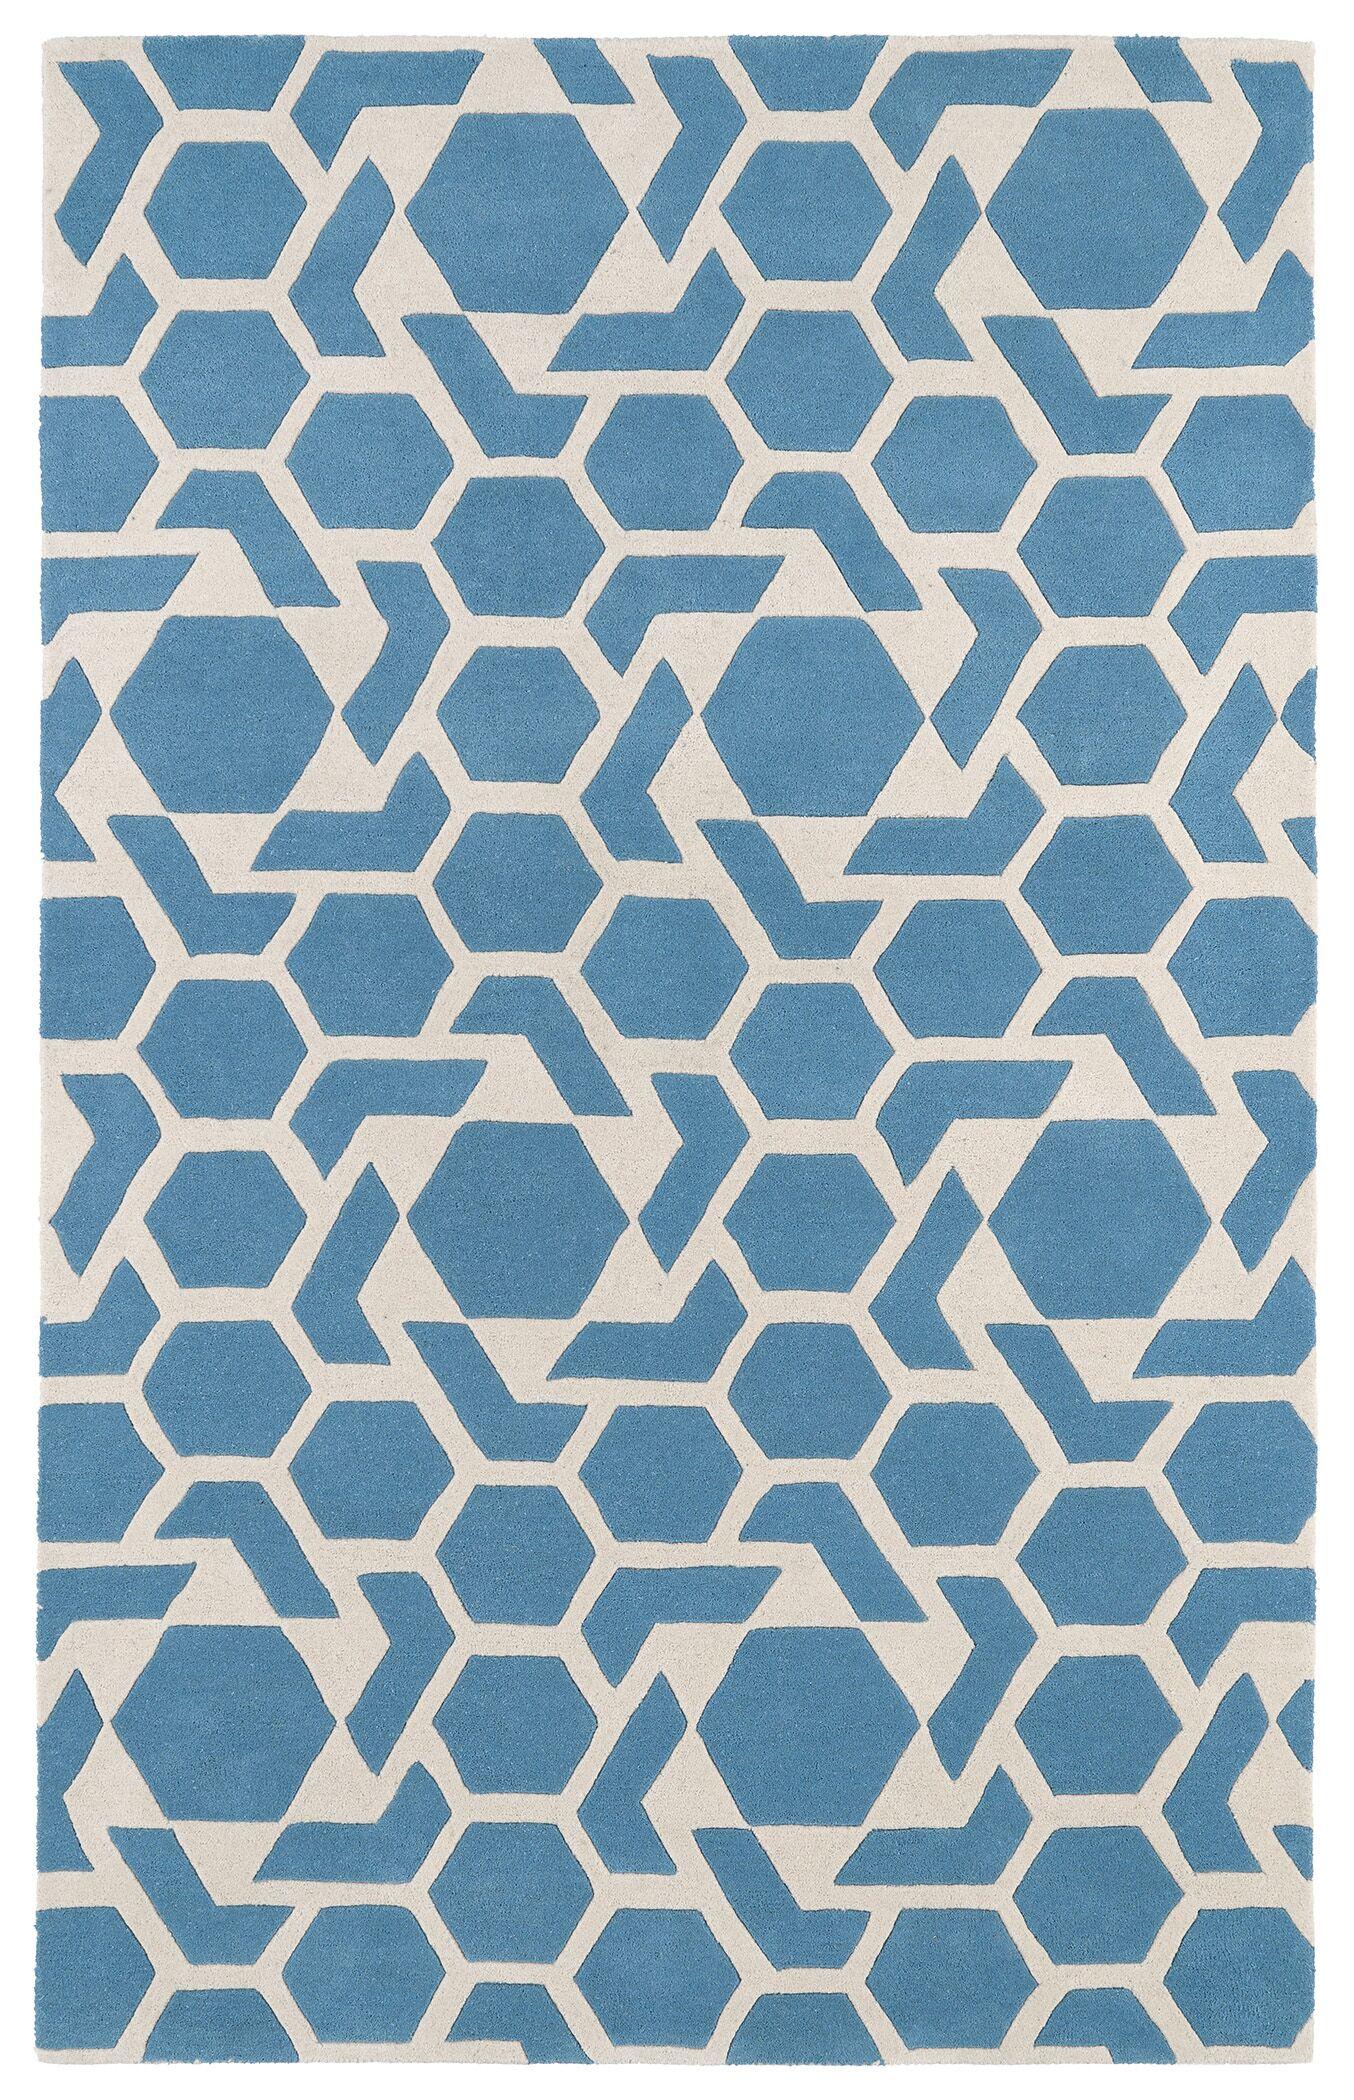 Fairlee Blue/White Area Rug Rug Size: Rectangle 5' x 7'9